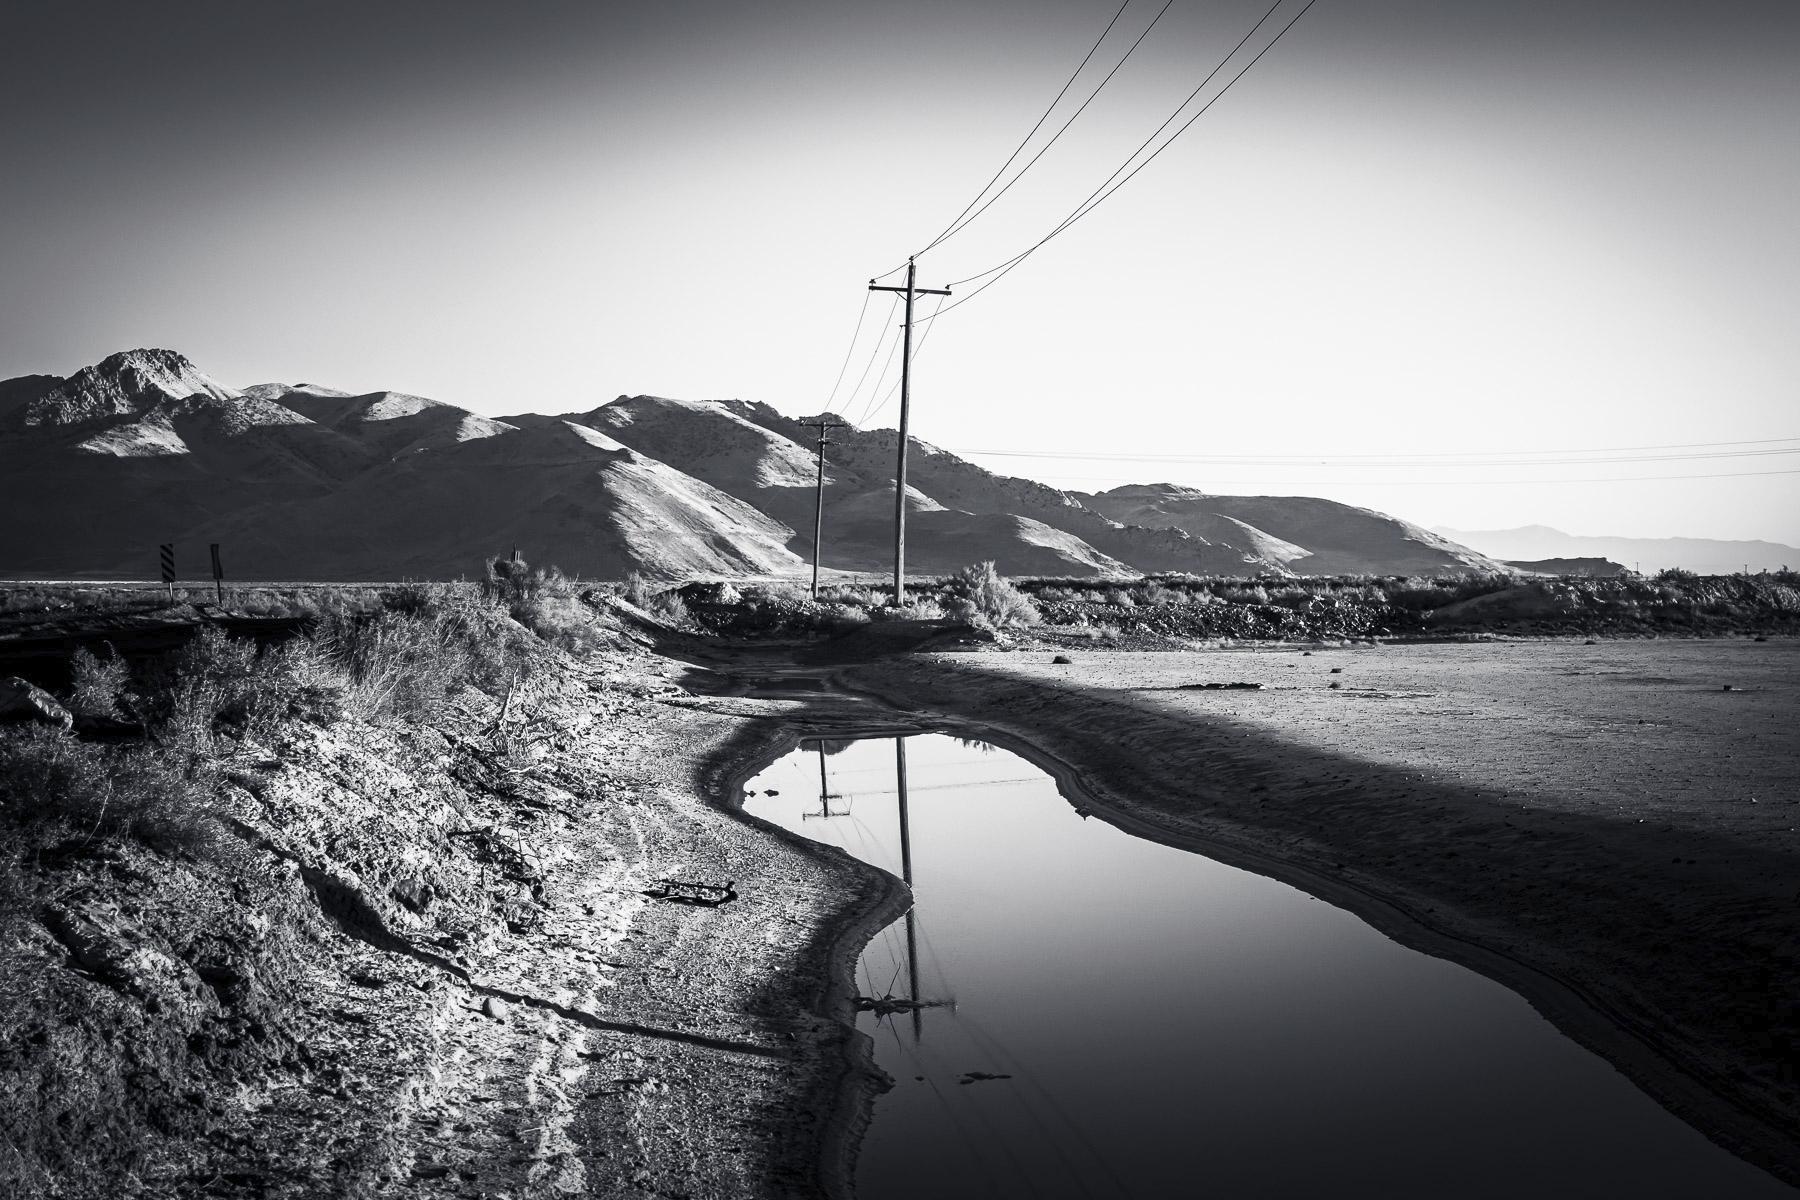 Bringing Electricity Desert Pow - 75centralphotography | ello